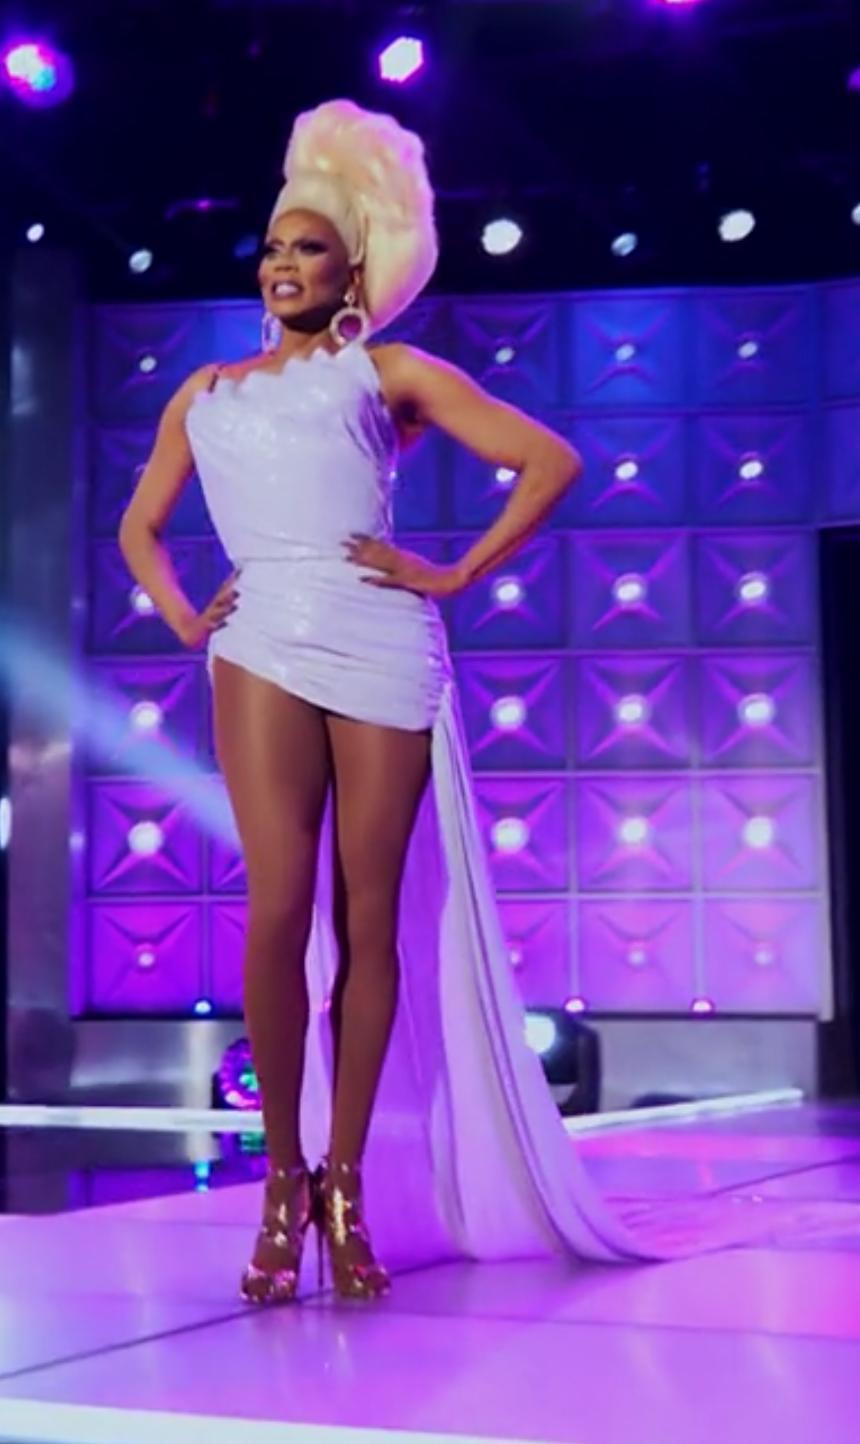 RuPaul's runway outfit.